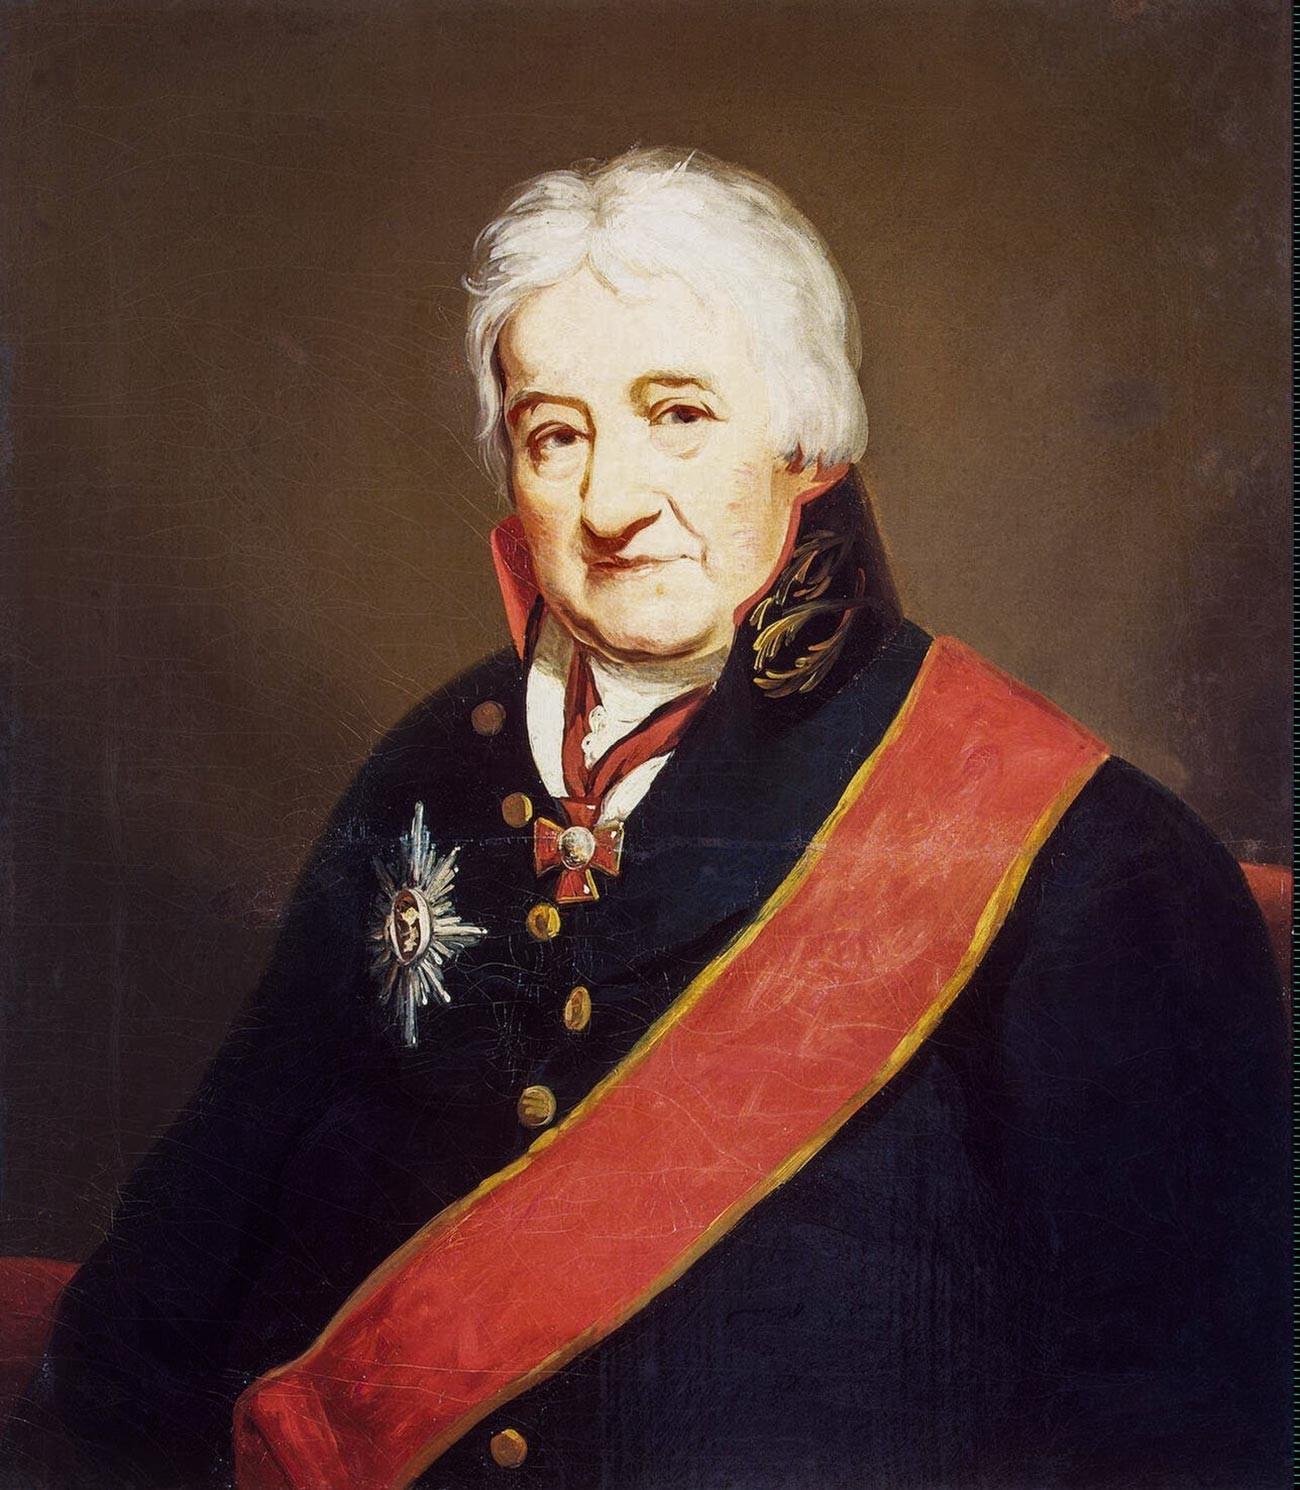 Charles Gascoigne von James Saxon, um 1804.